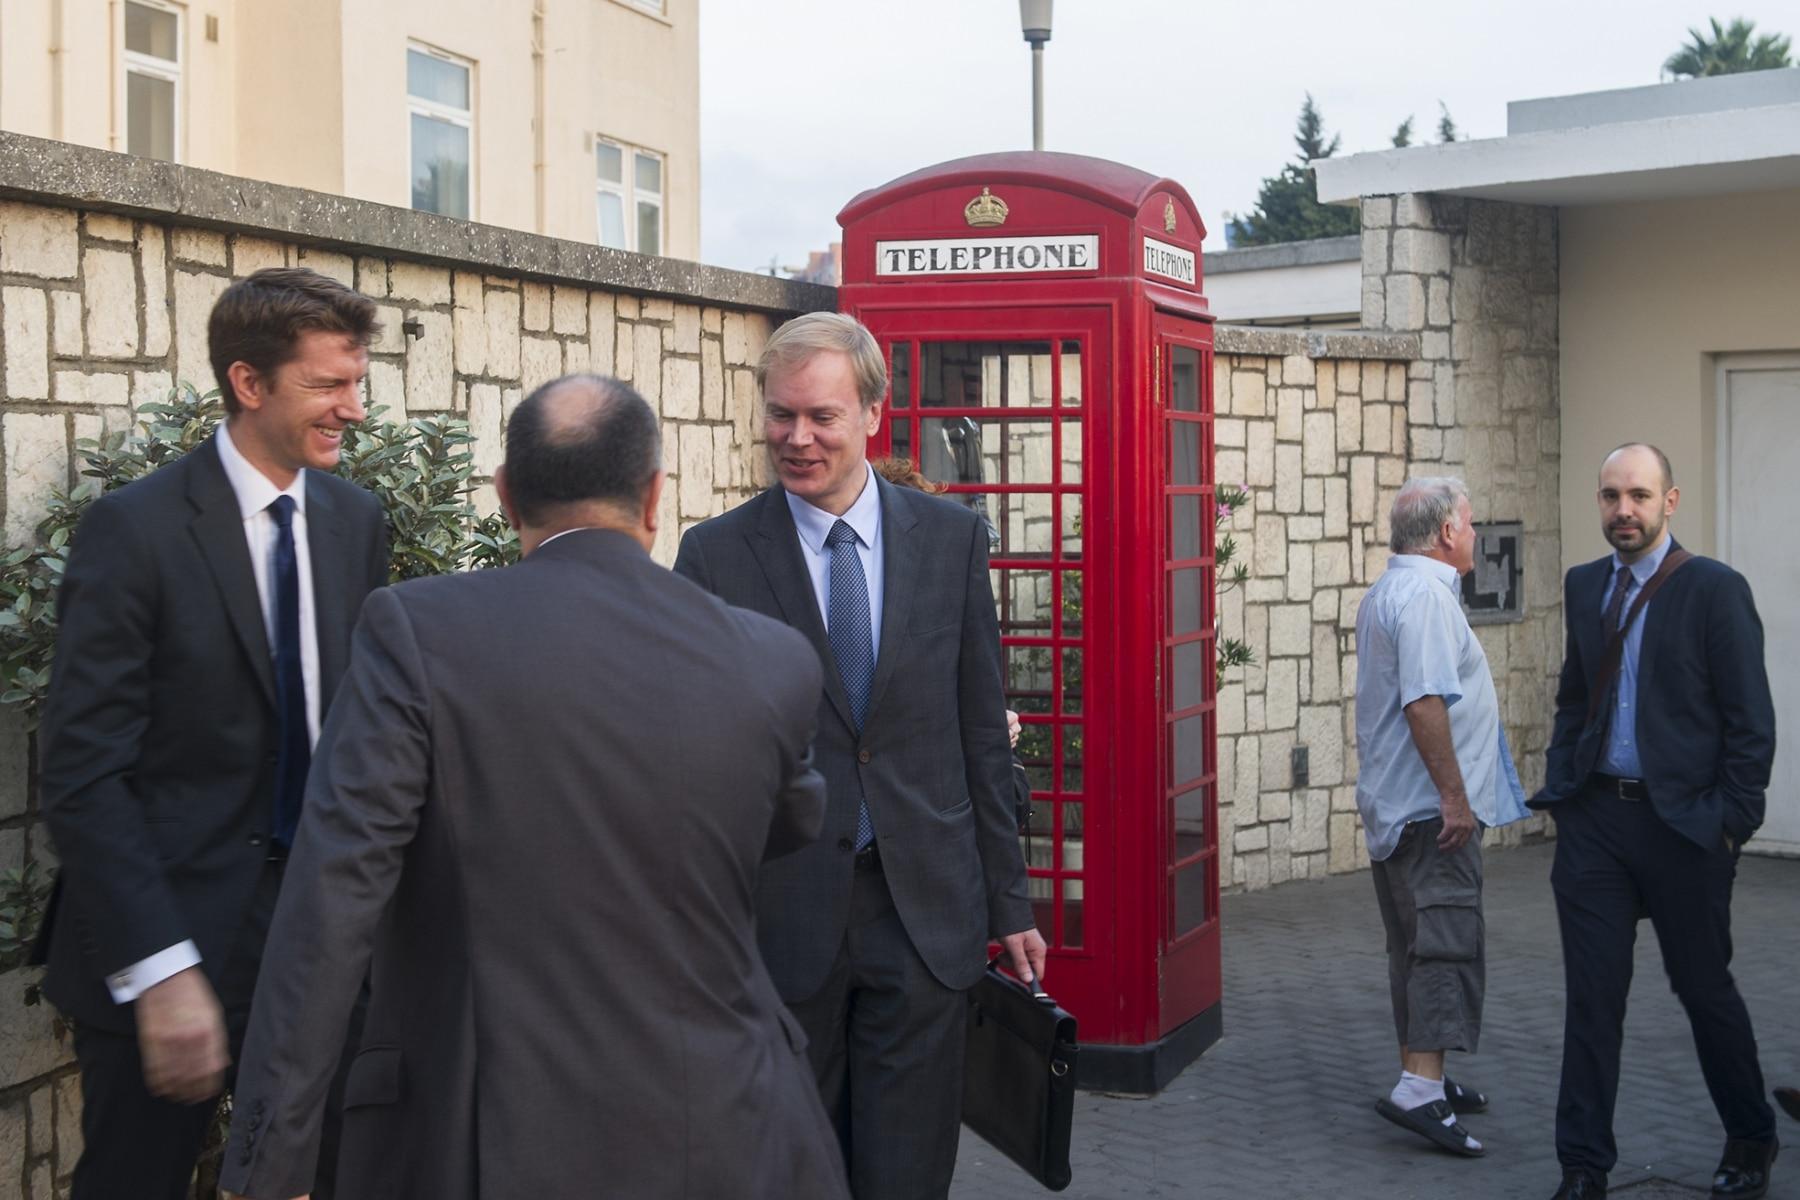 Gibraltar, 25 septiembre 2013. Miembros de la Comisión Europea recibidos por los abogados del Gobierno Gibraltareño. MARCOS MORENO